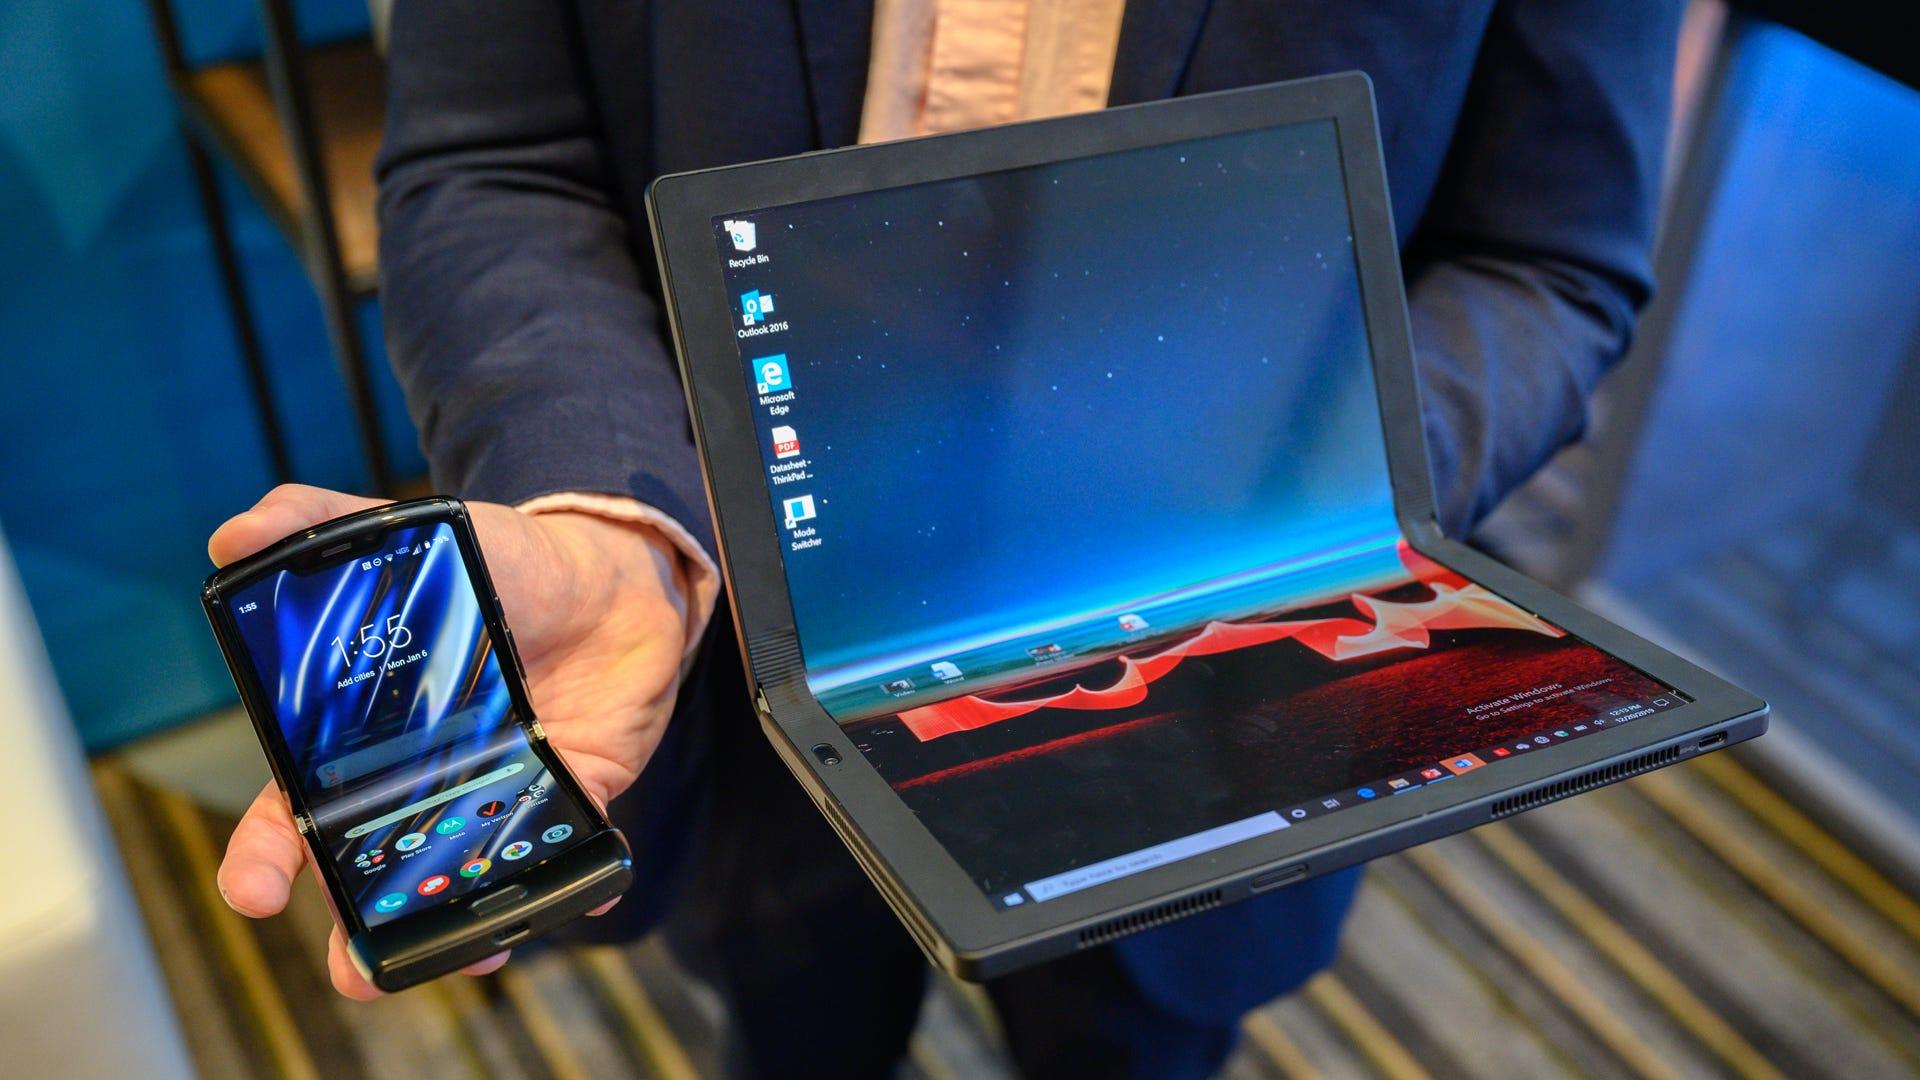 The Motorola Razr and Lenovo ThinkPad X1 Fold